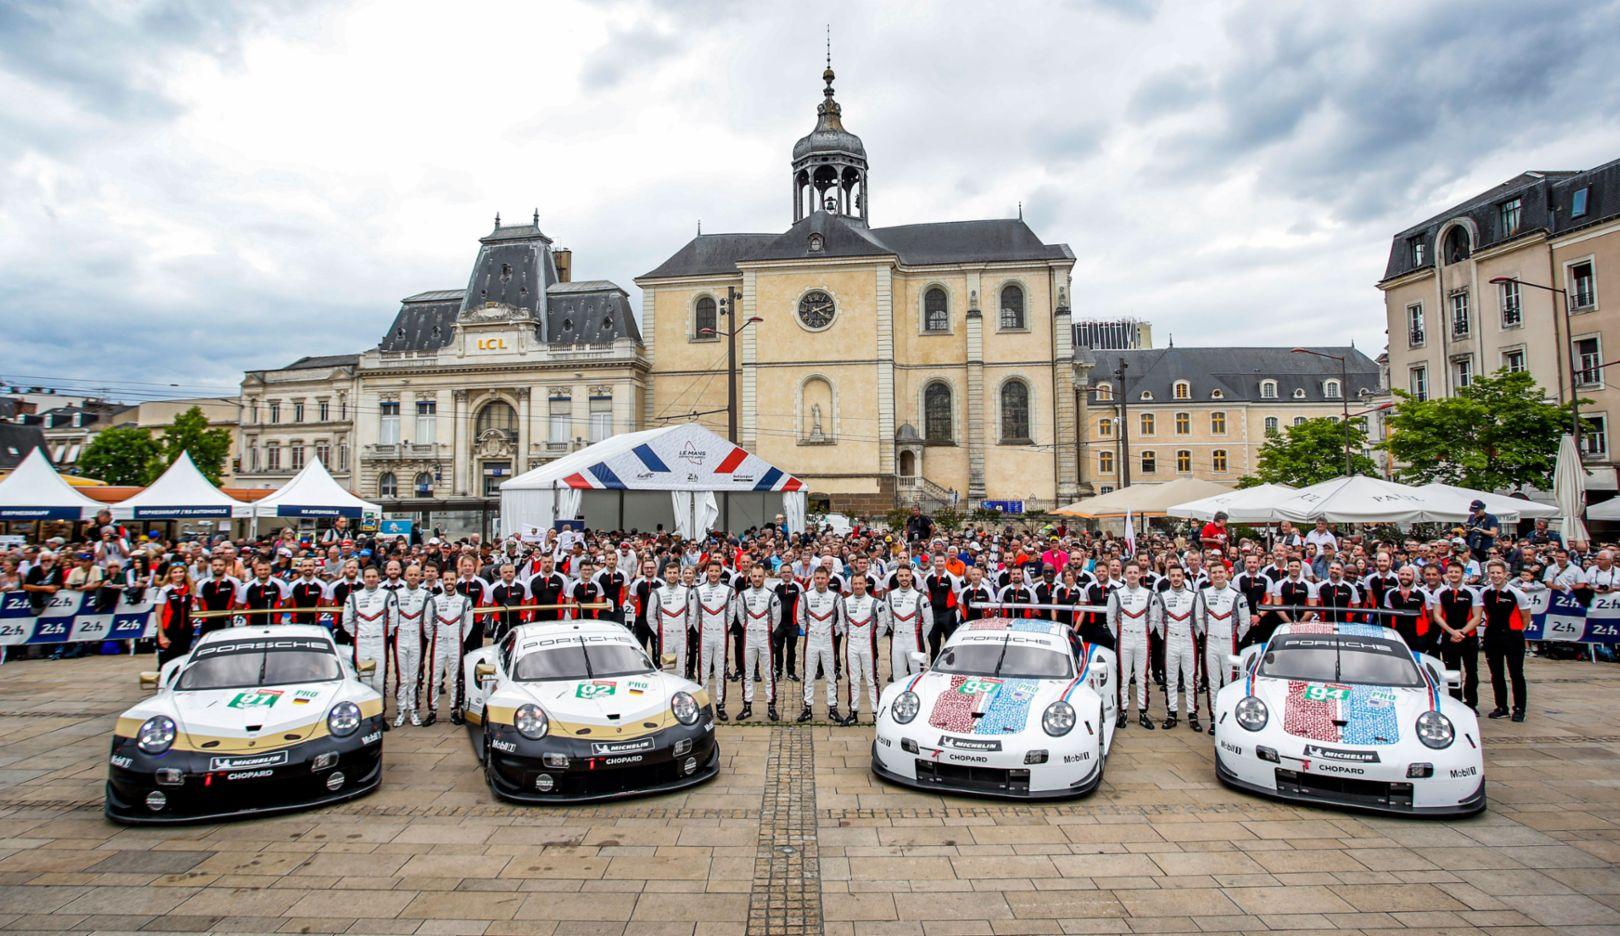 911 RSR, scrutineering, FIA WEC, Le Mans, 2019, Porsche AG